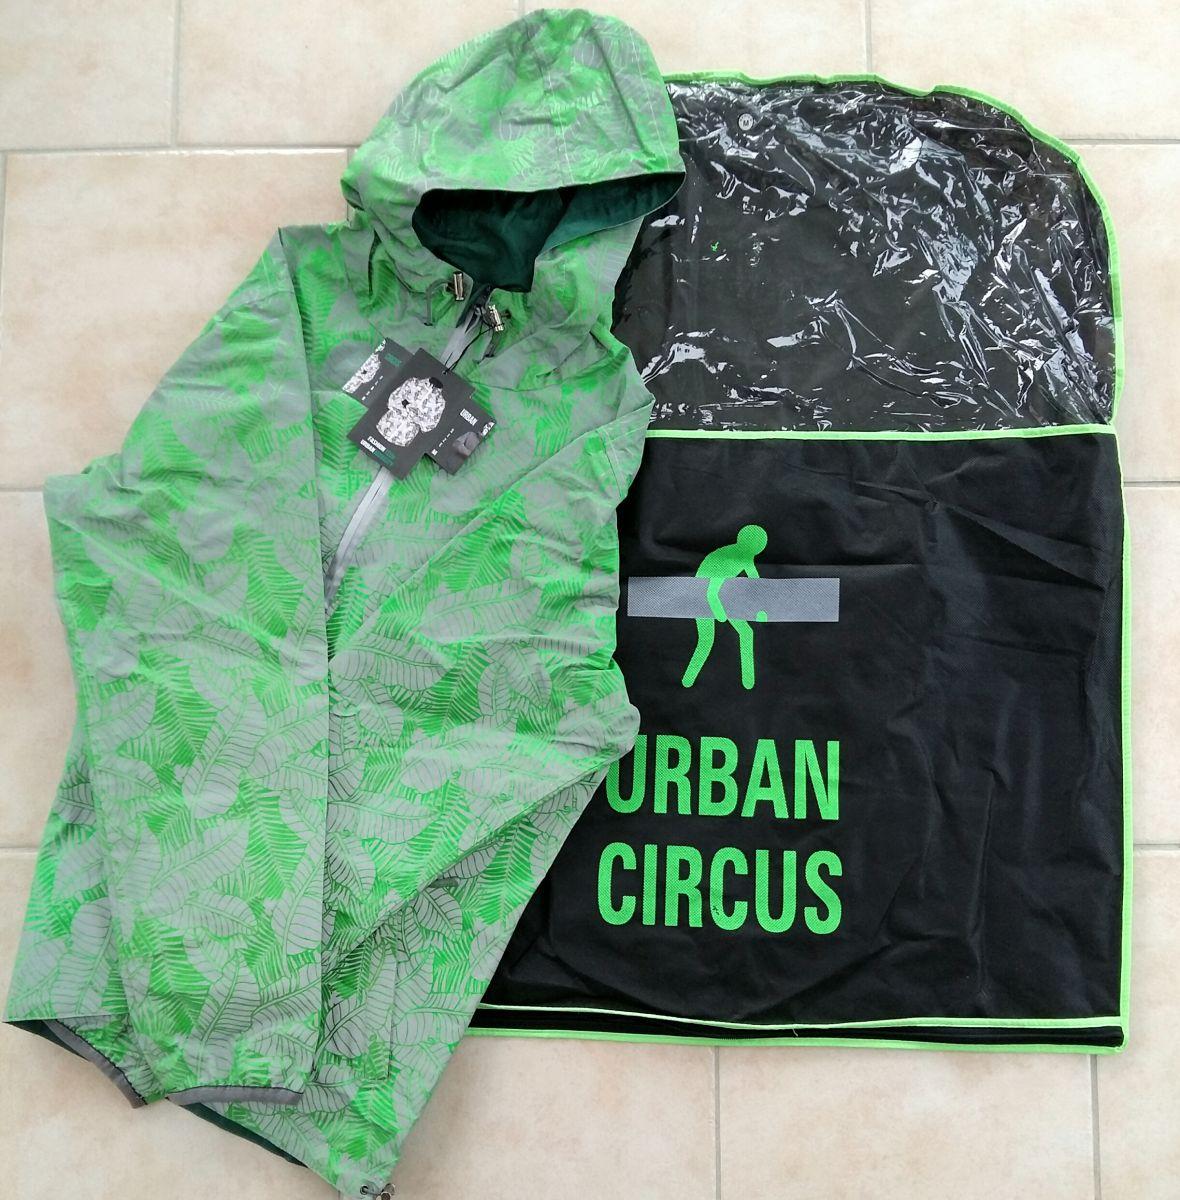 Urban circus 1